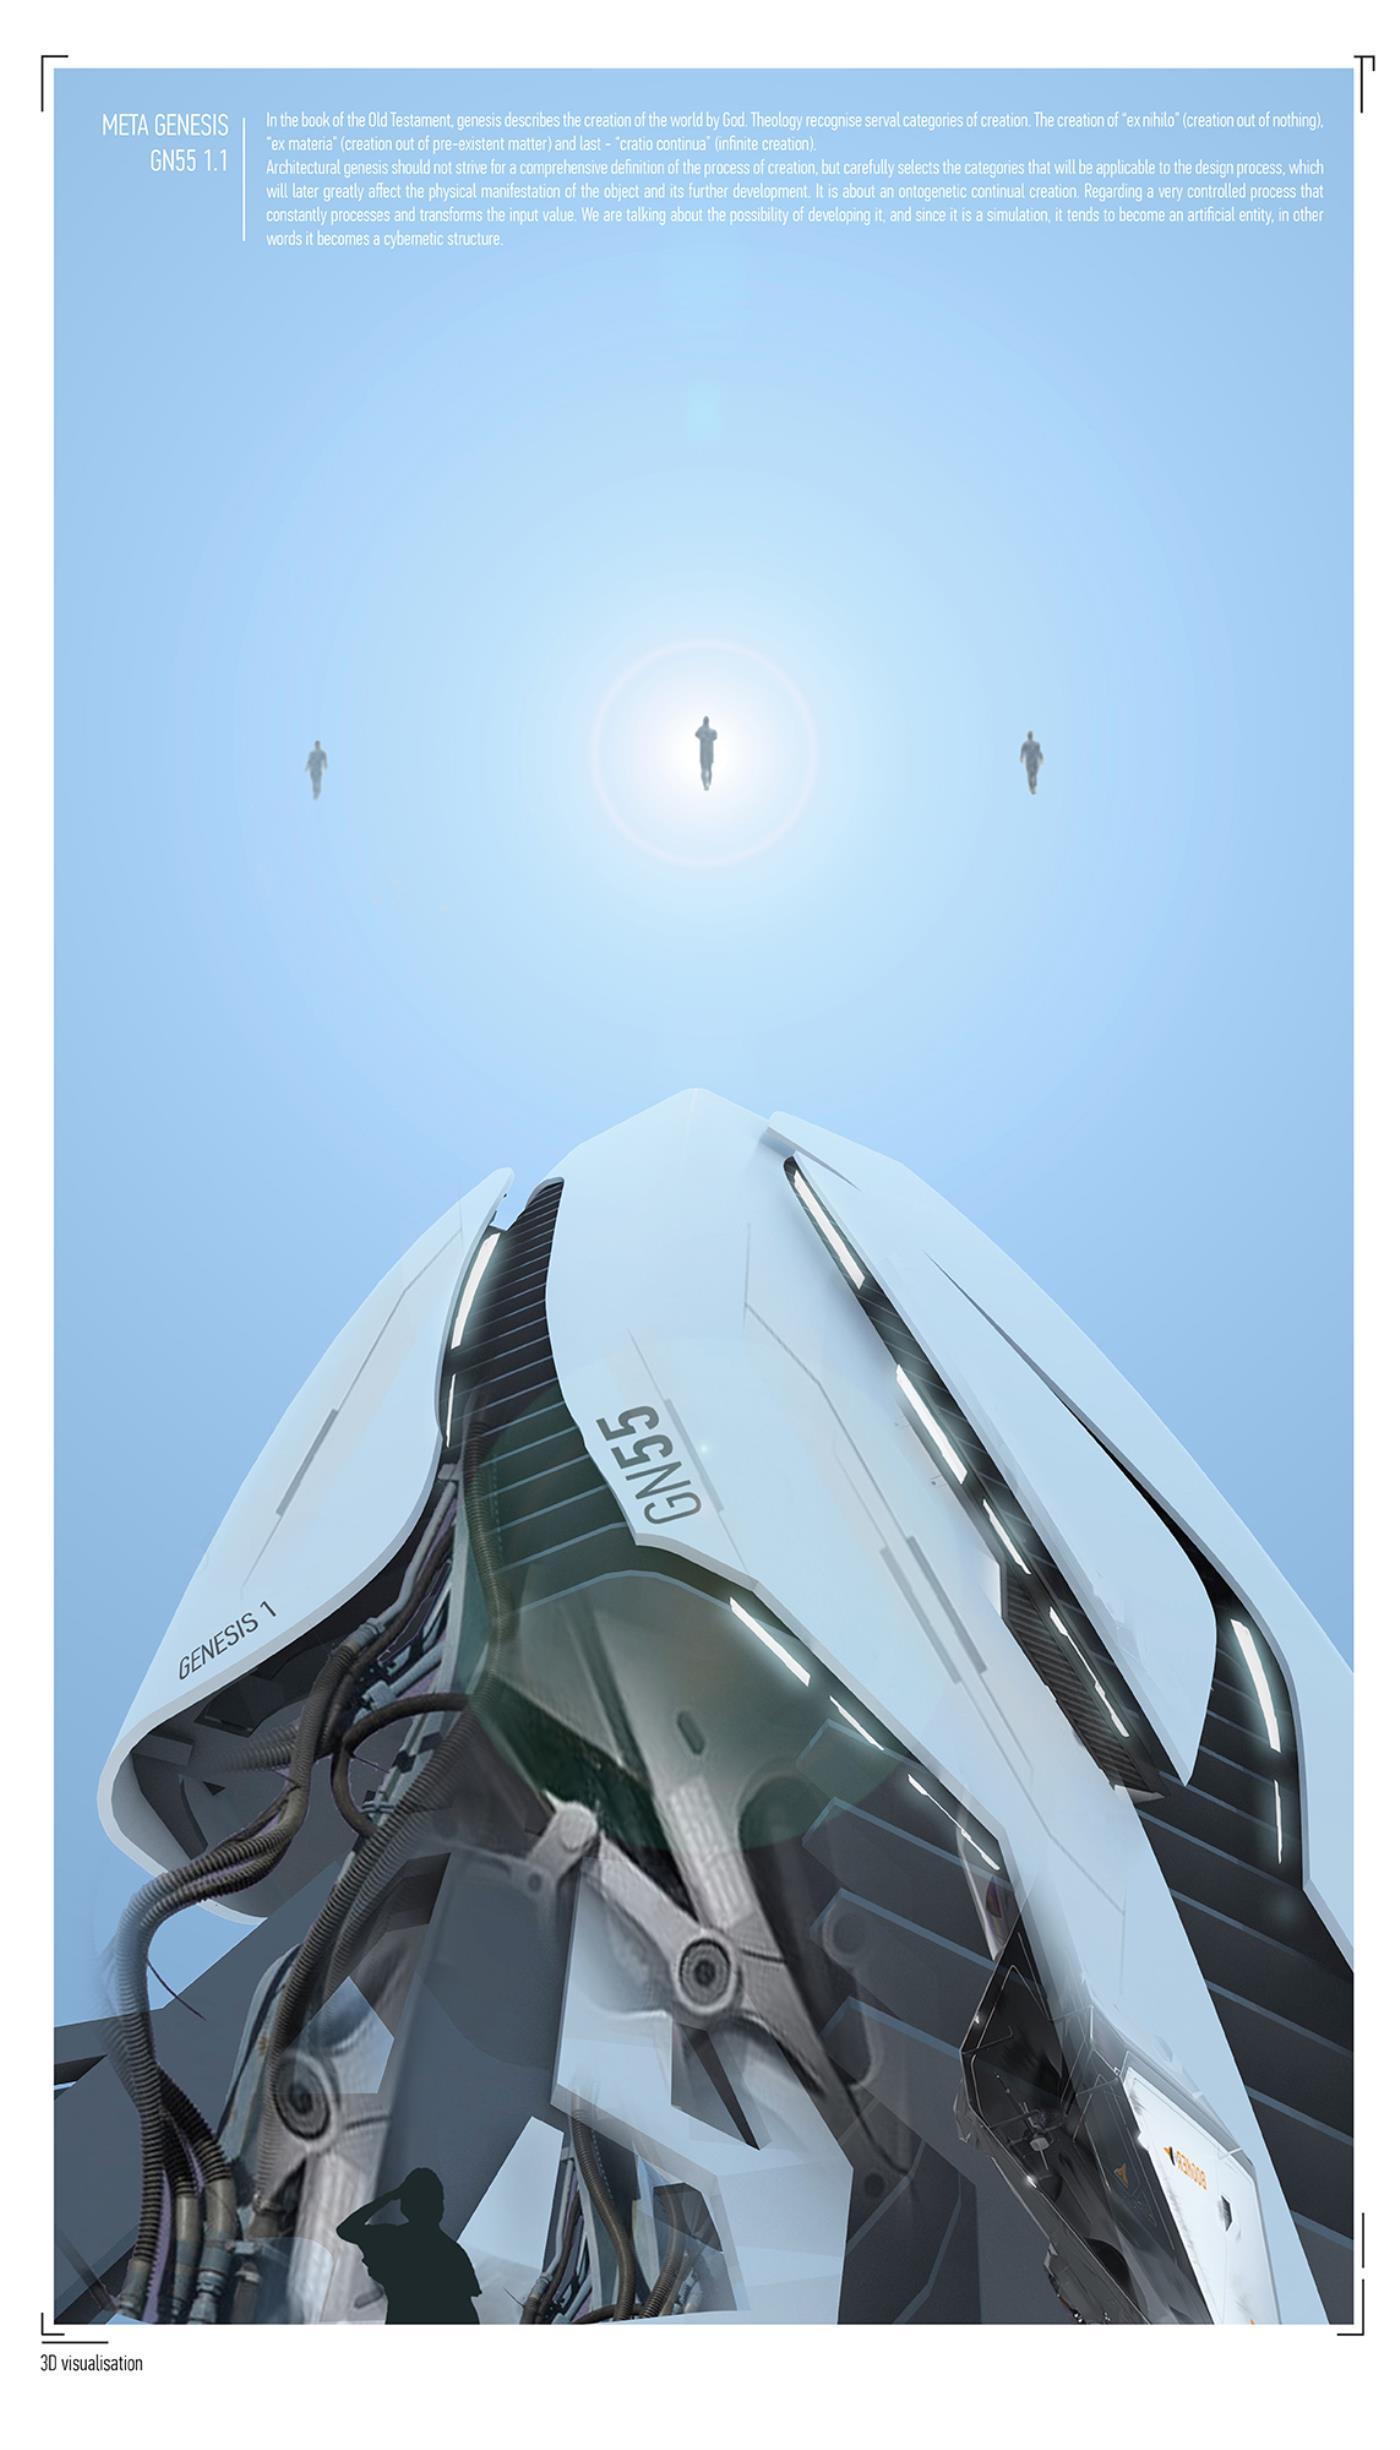 Vertical Multifunctional Center / Genesis